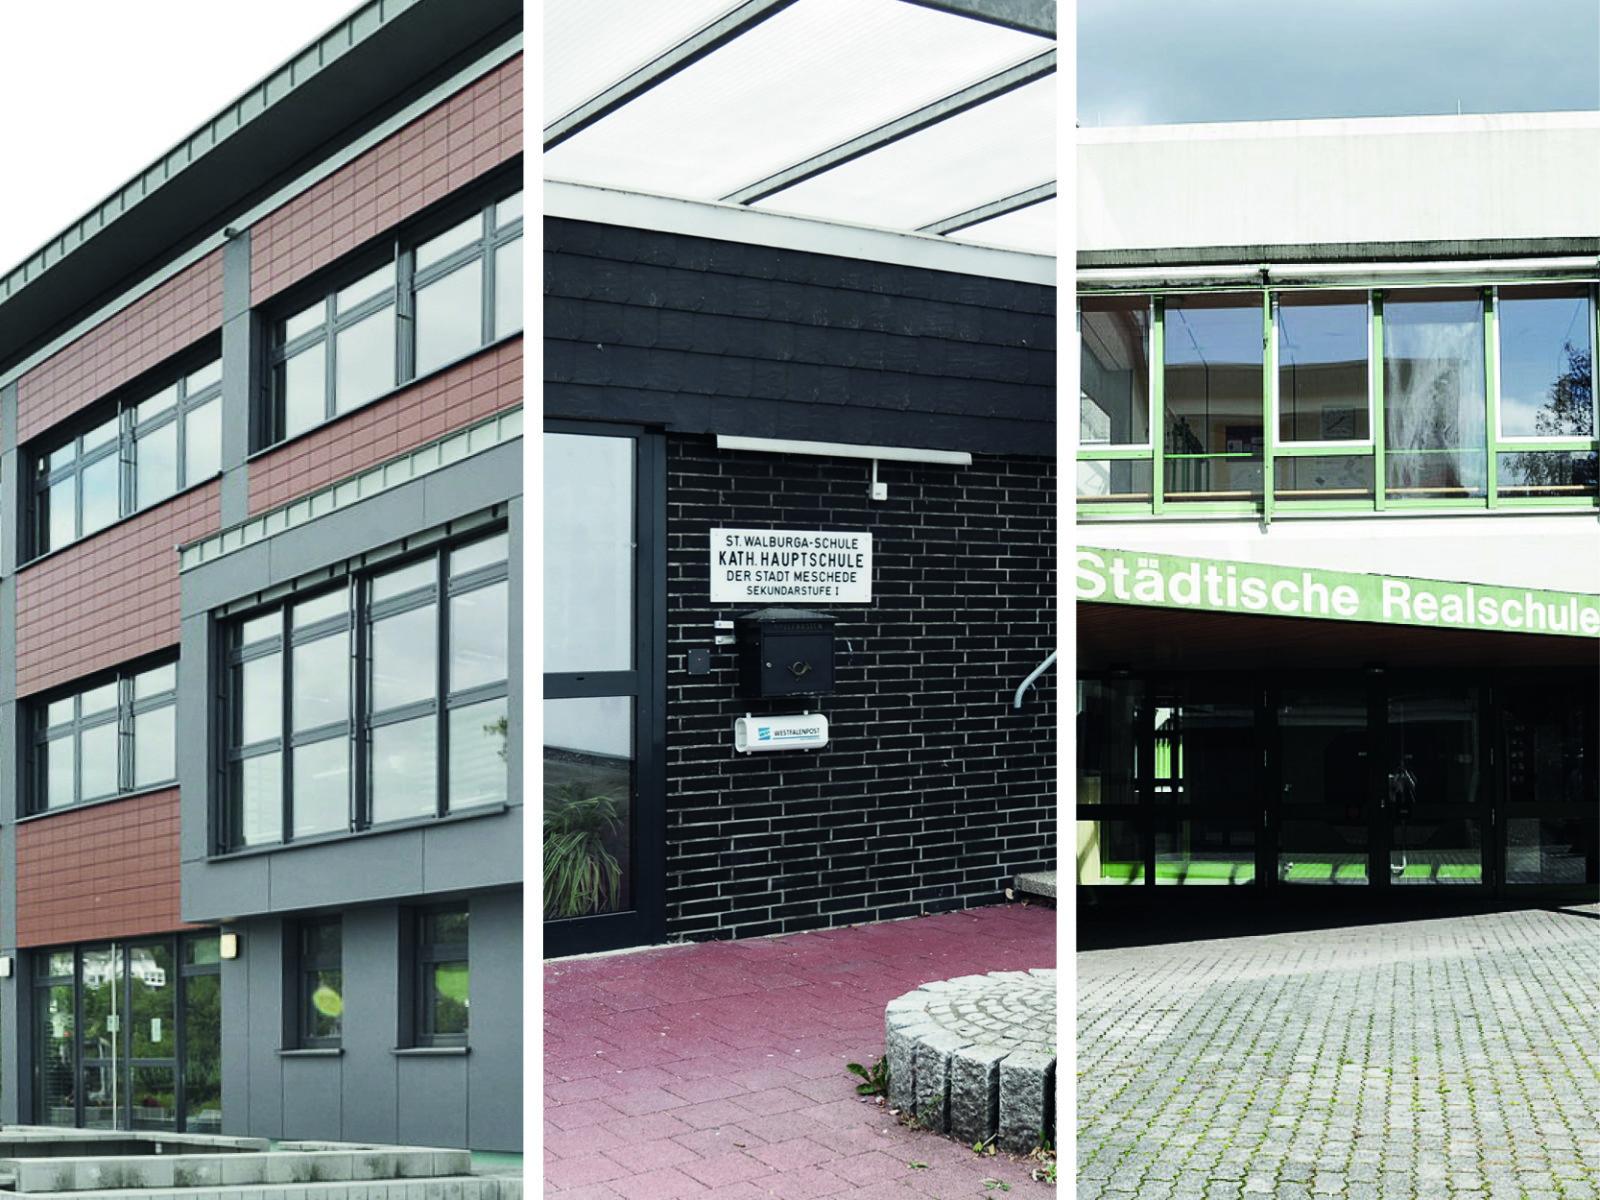 MBKS Meschede-August-Macke-Schulzentrum